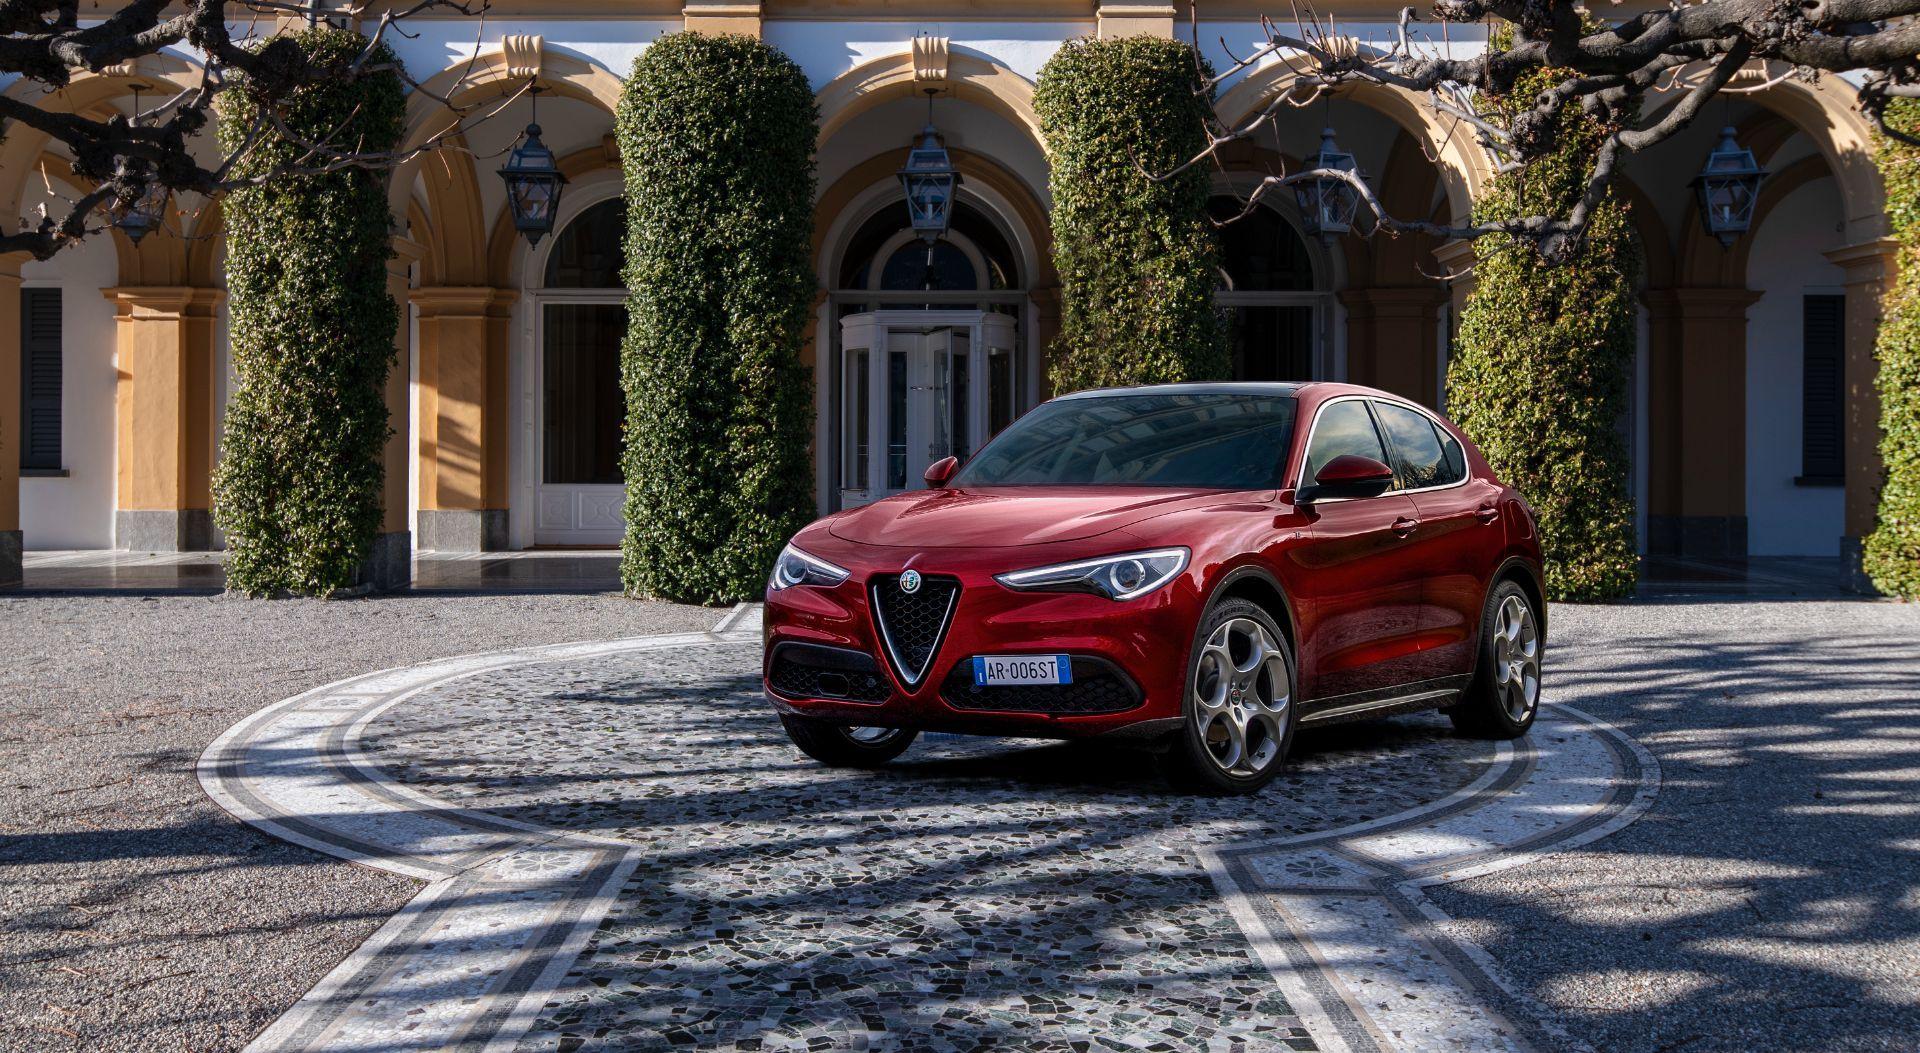 Alfa-Romeo-Giulia-and-Stelvio-6C-Villa-dEste-4